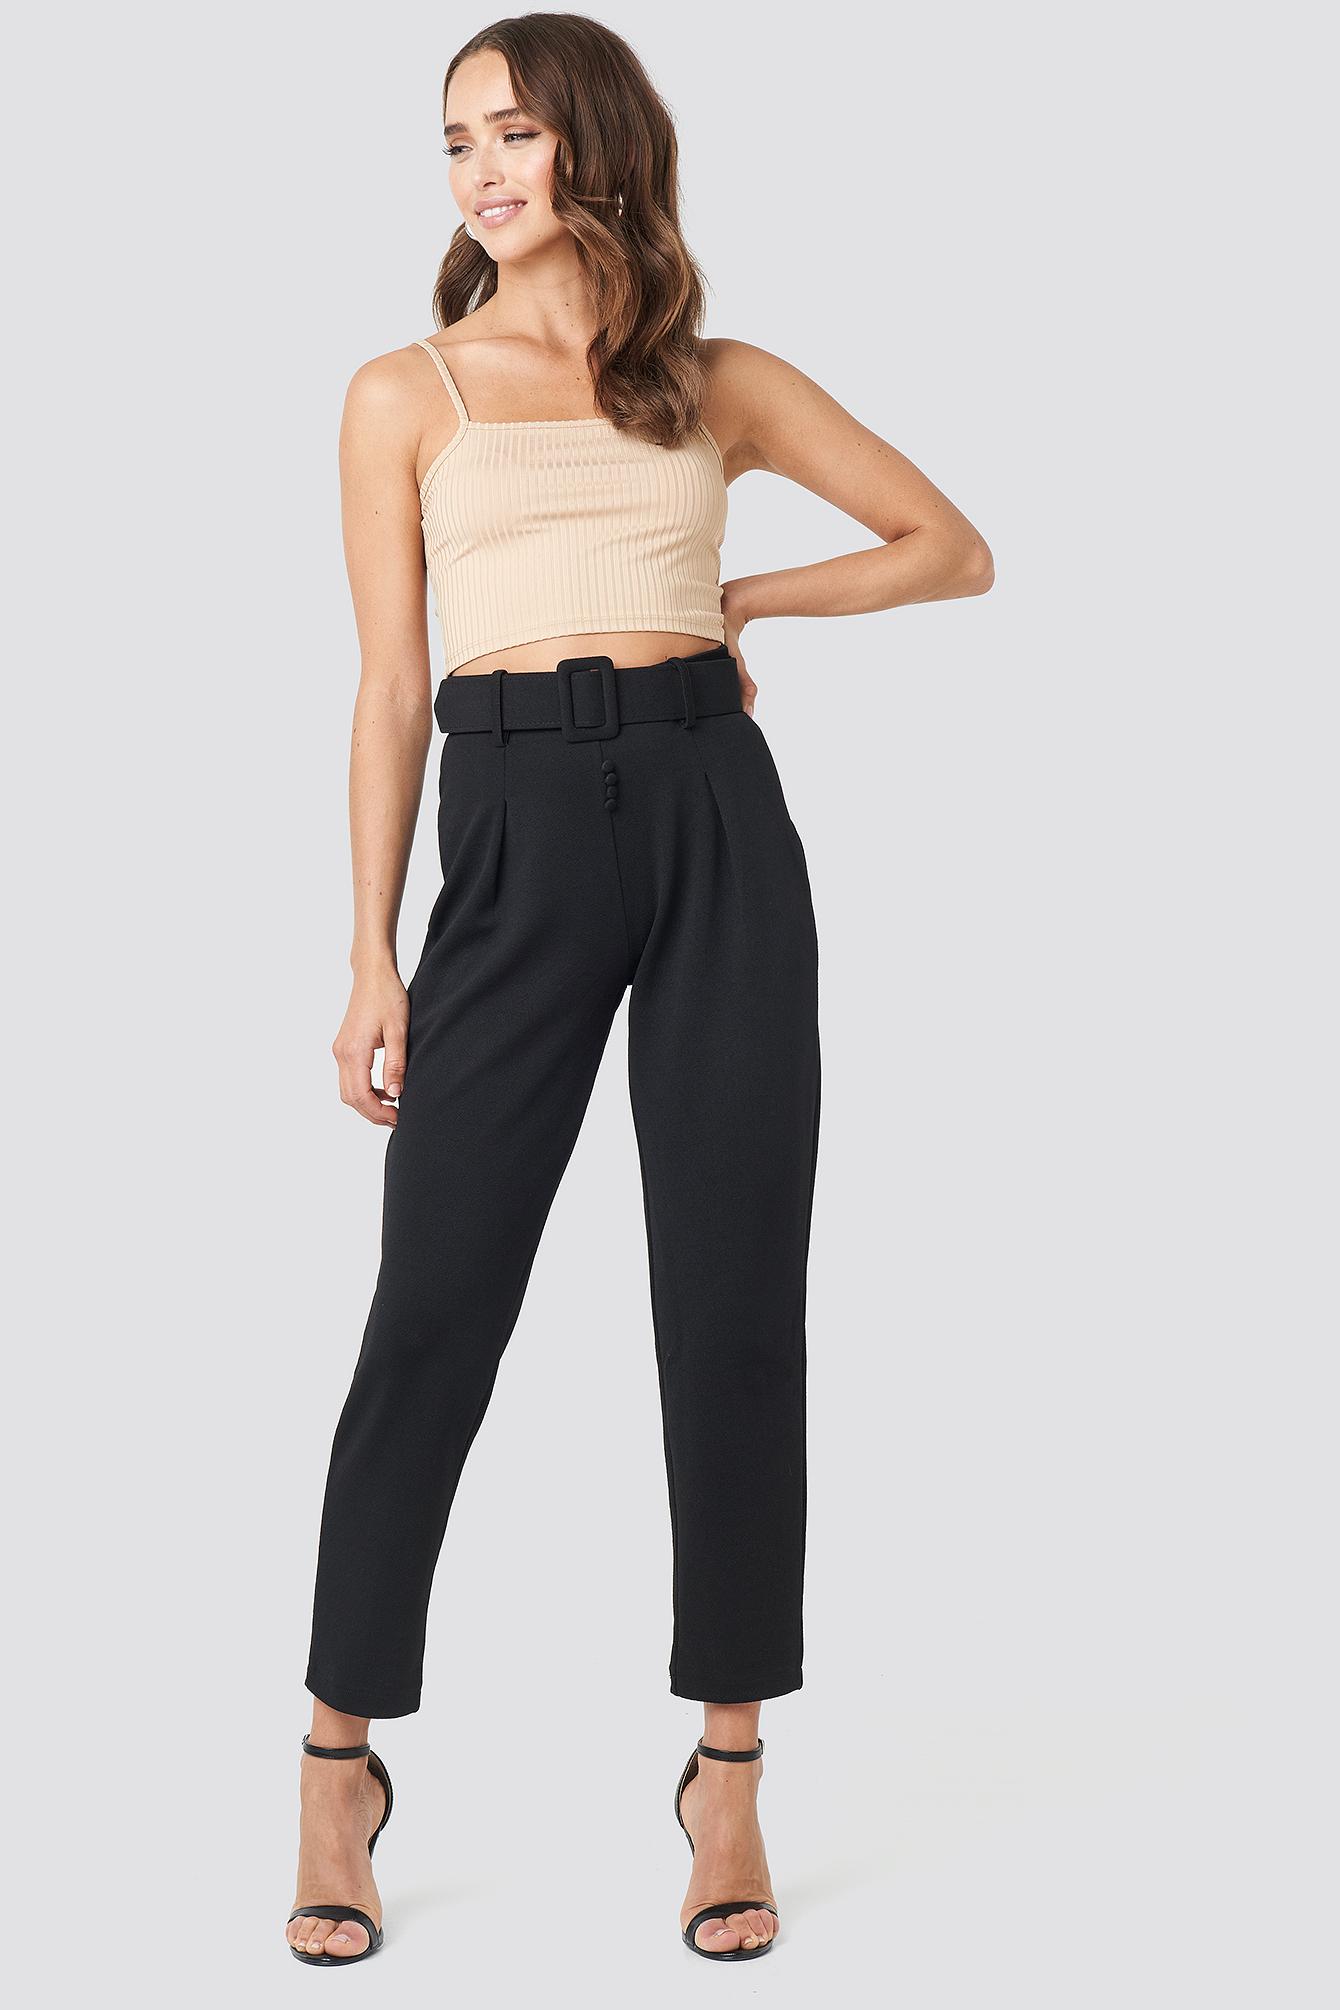 Carmen Cropped Pants Noir by Trendyol